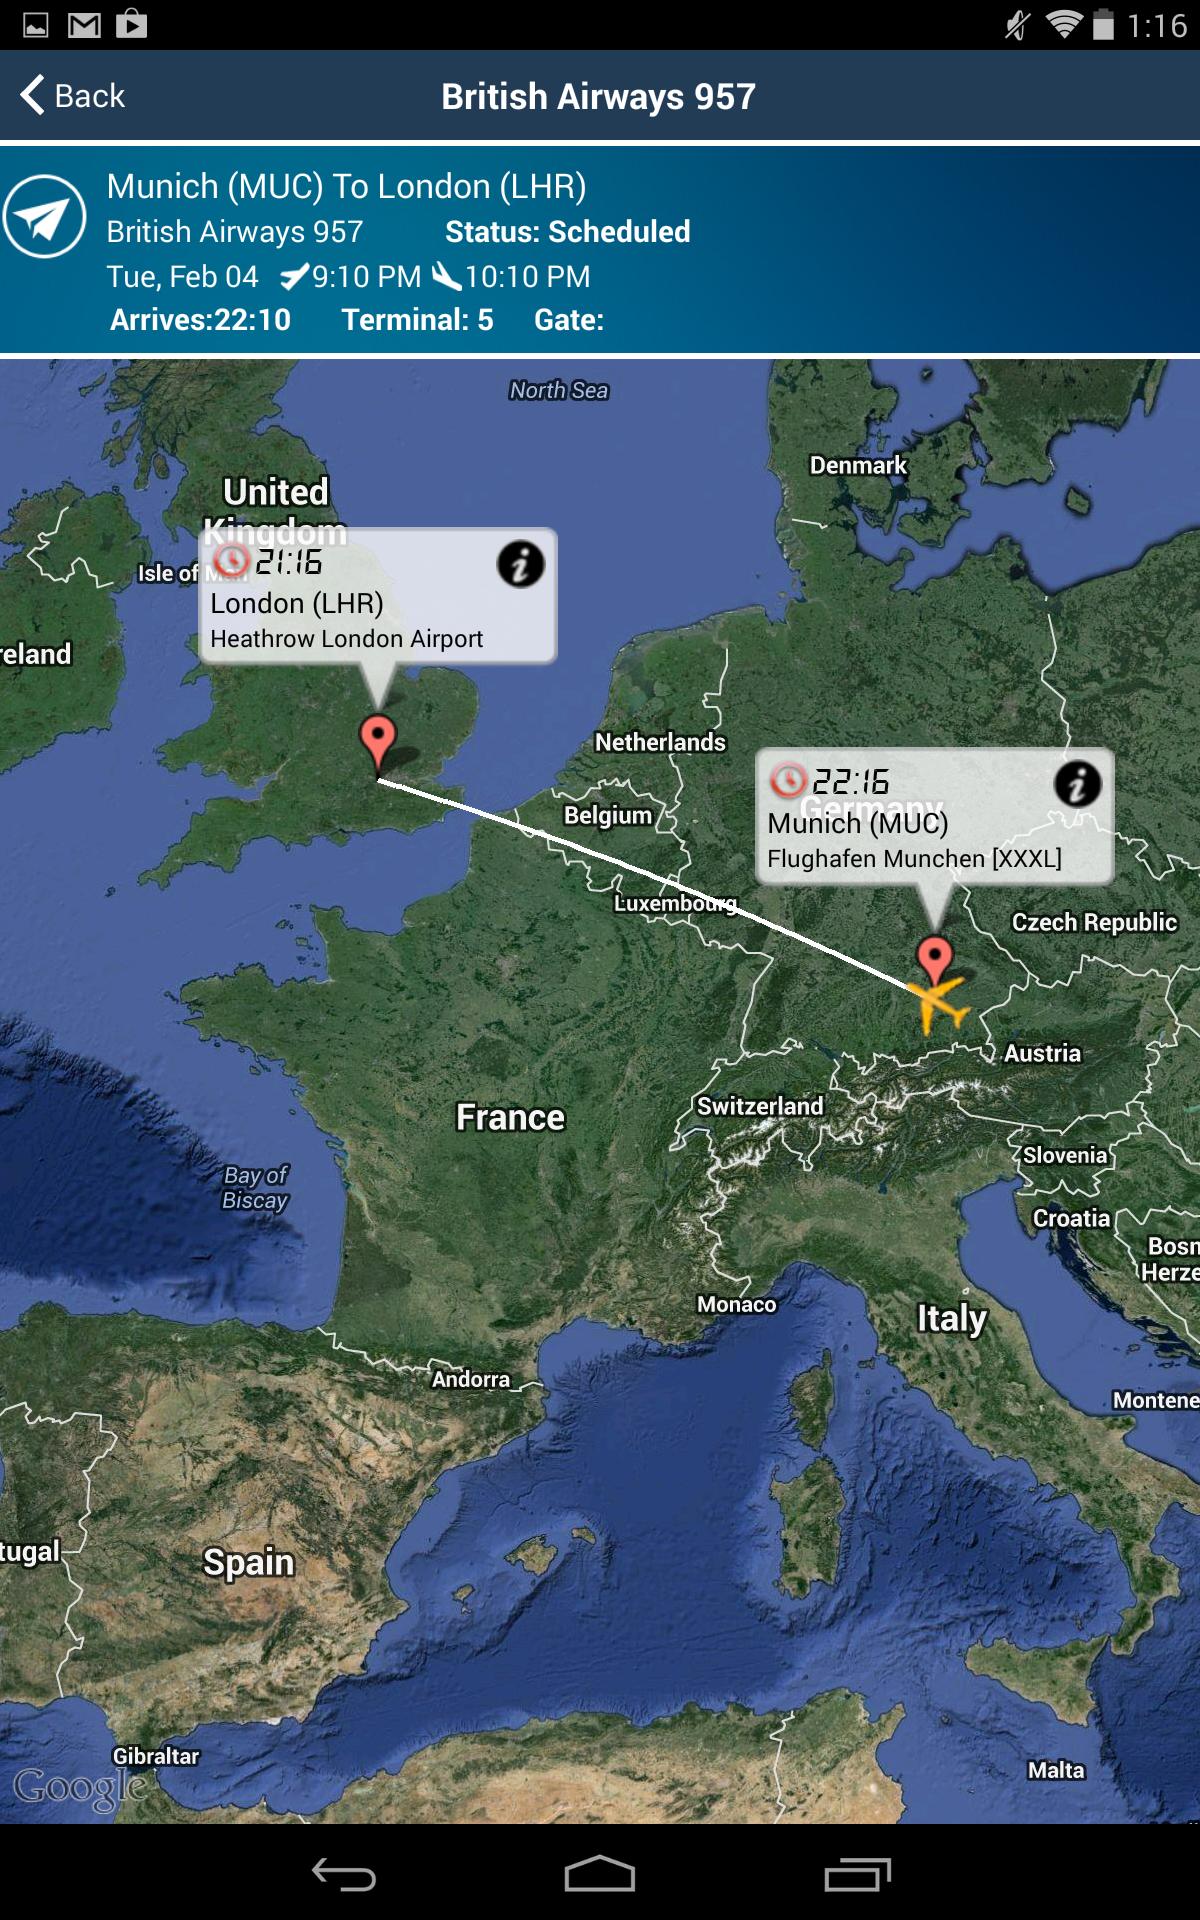 Flughäfen + Flug-Tracker: Amazon.de: Apps für Android